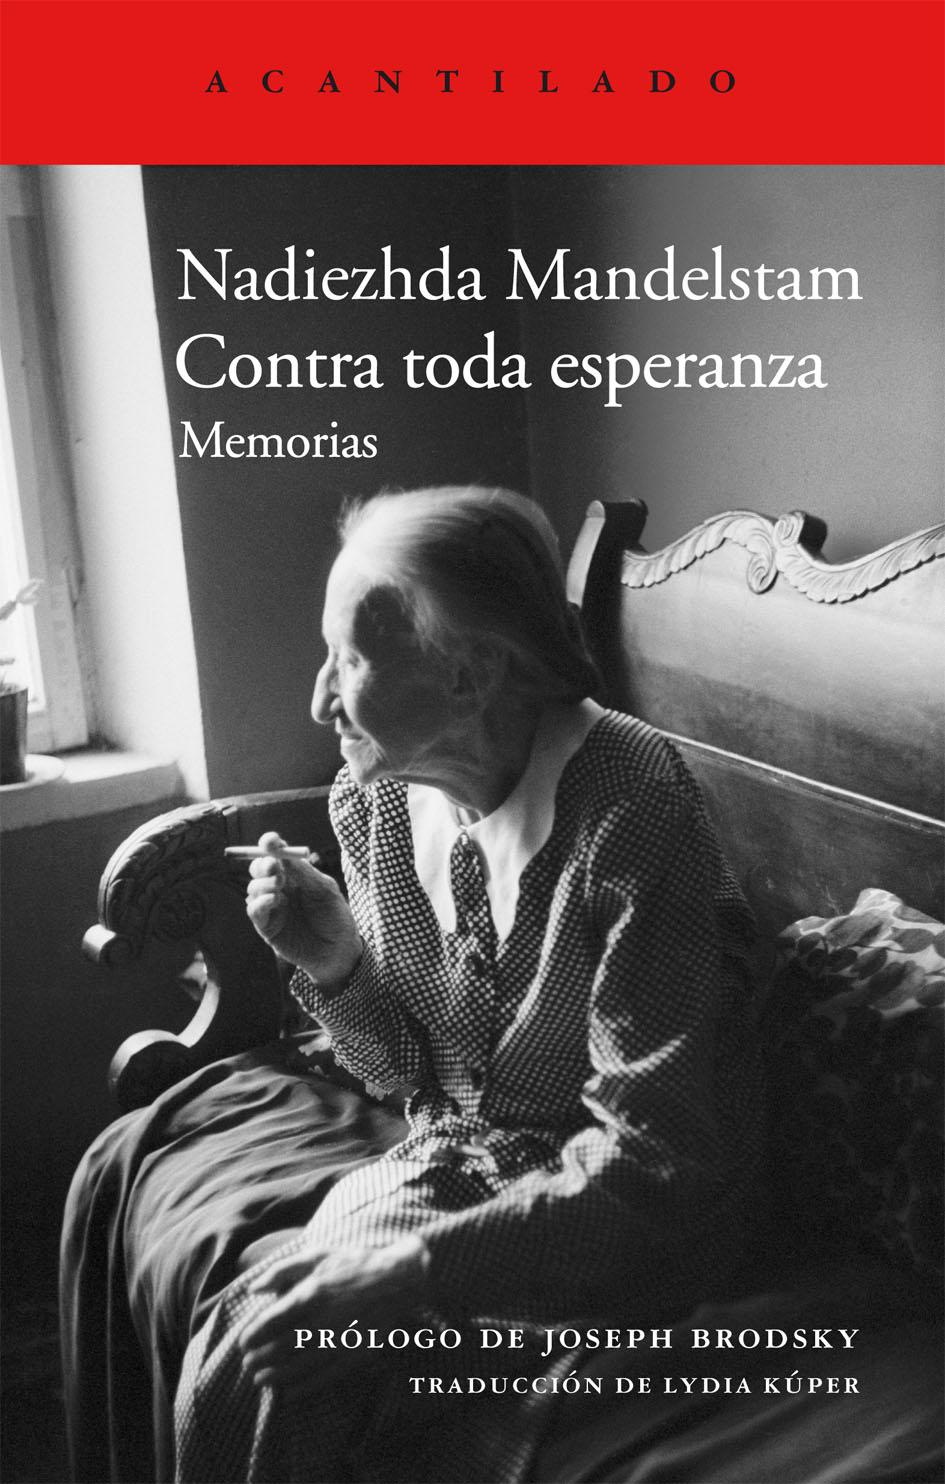 https://www.hislibris.com/wp-content/uploads/2013/08/contra-toda-esperanza-9788415689102.jpg